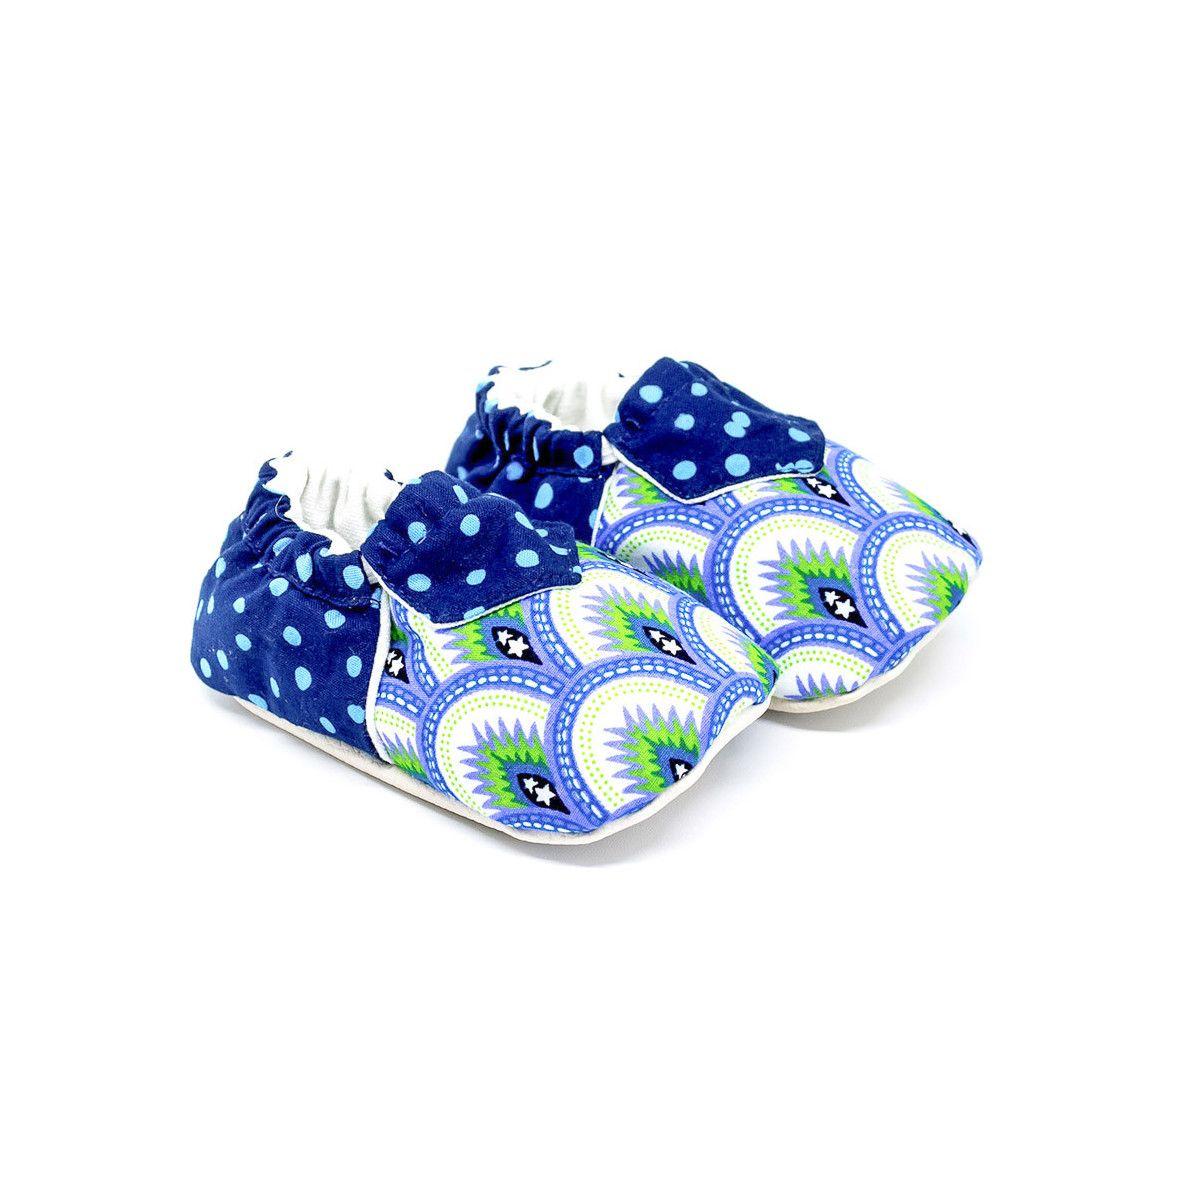 Chaussons bébé souples bleu et vert